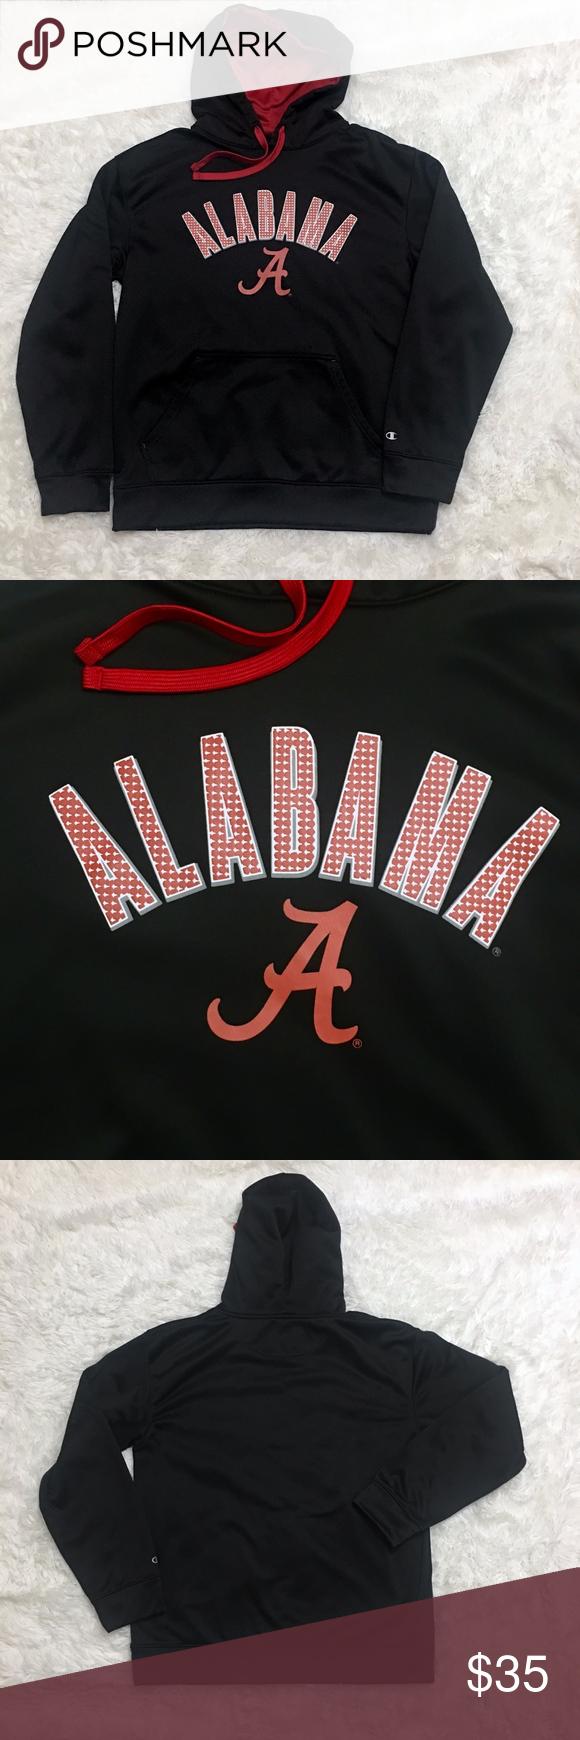 Champion University Of Alabama Hoodie Med Alabama Hoodie Sweatshirt Shirt Champion Shirts [ 1740 x 580 Pixel ]